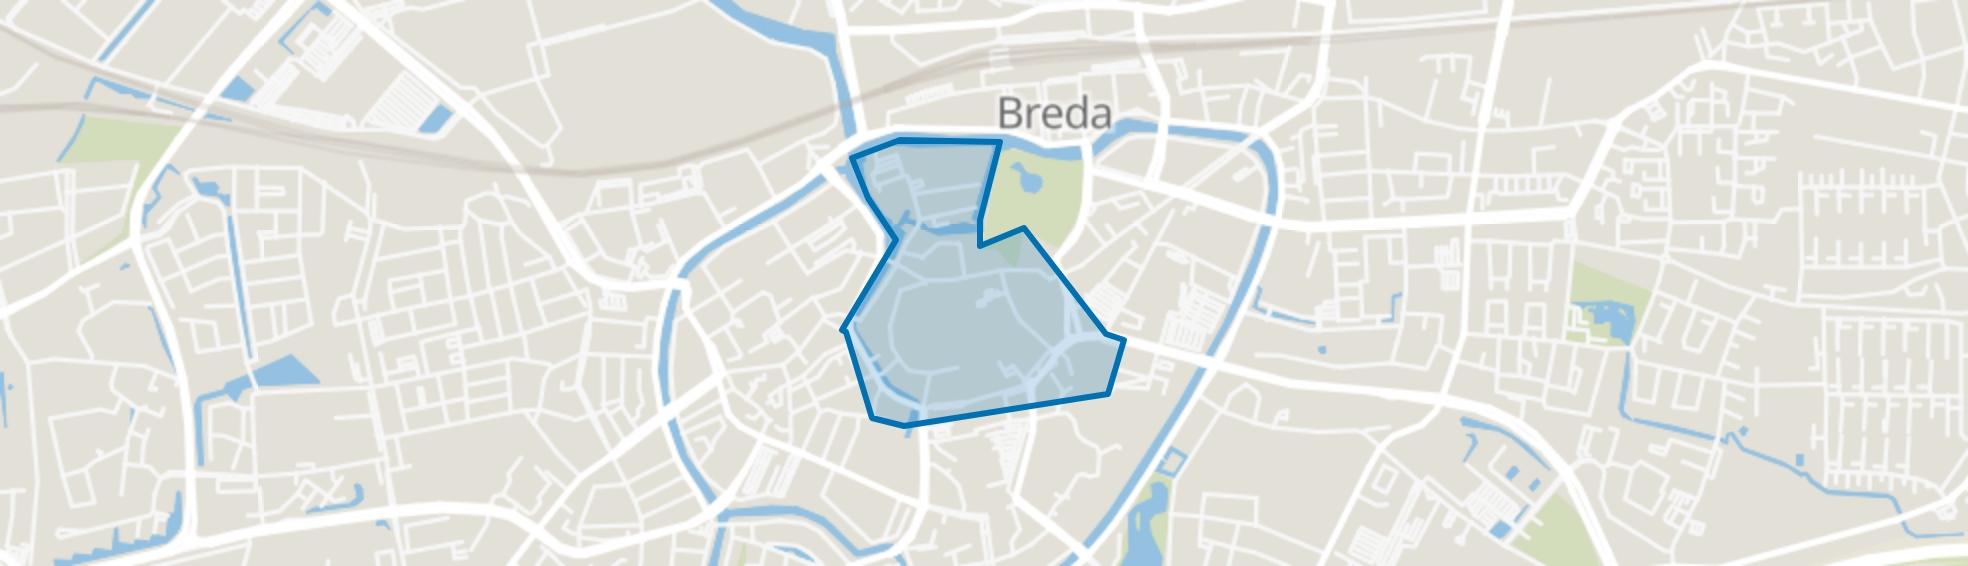 City, Breda map